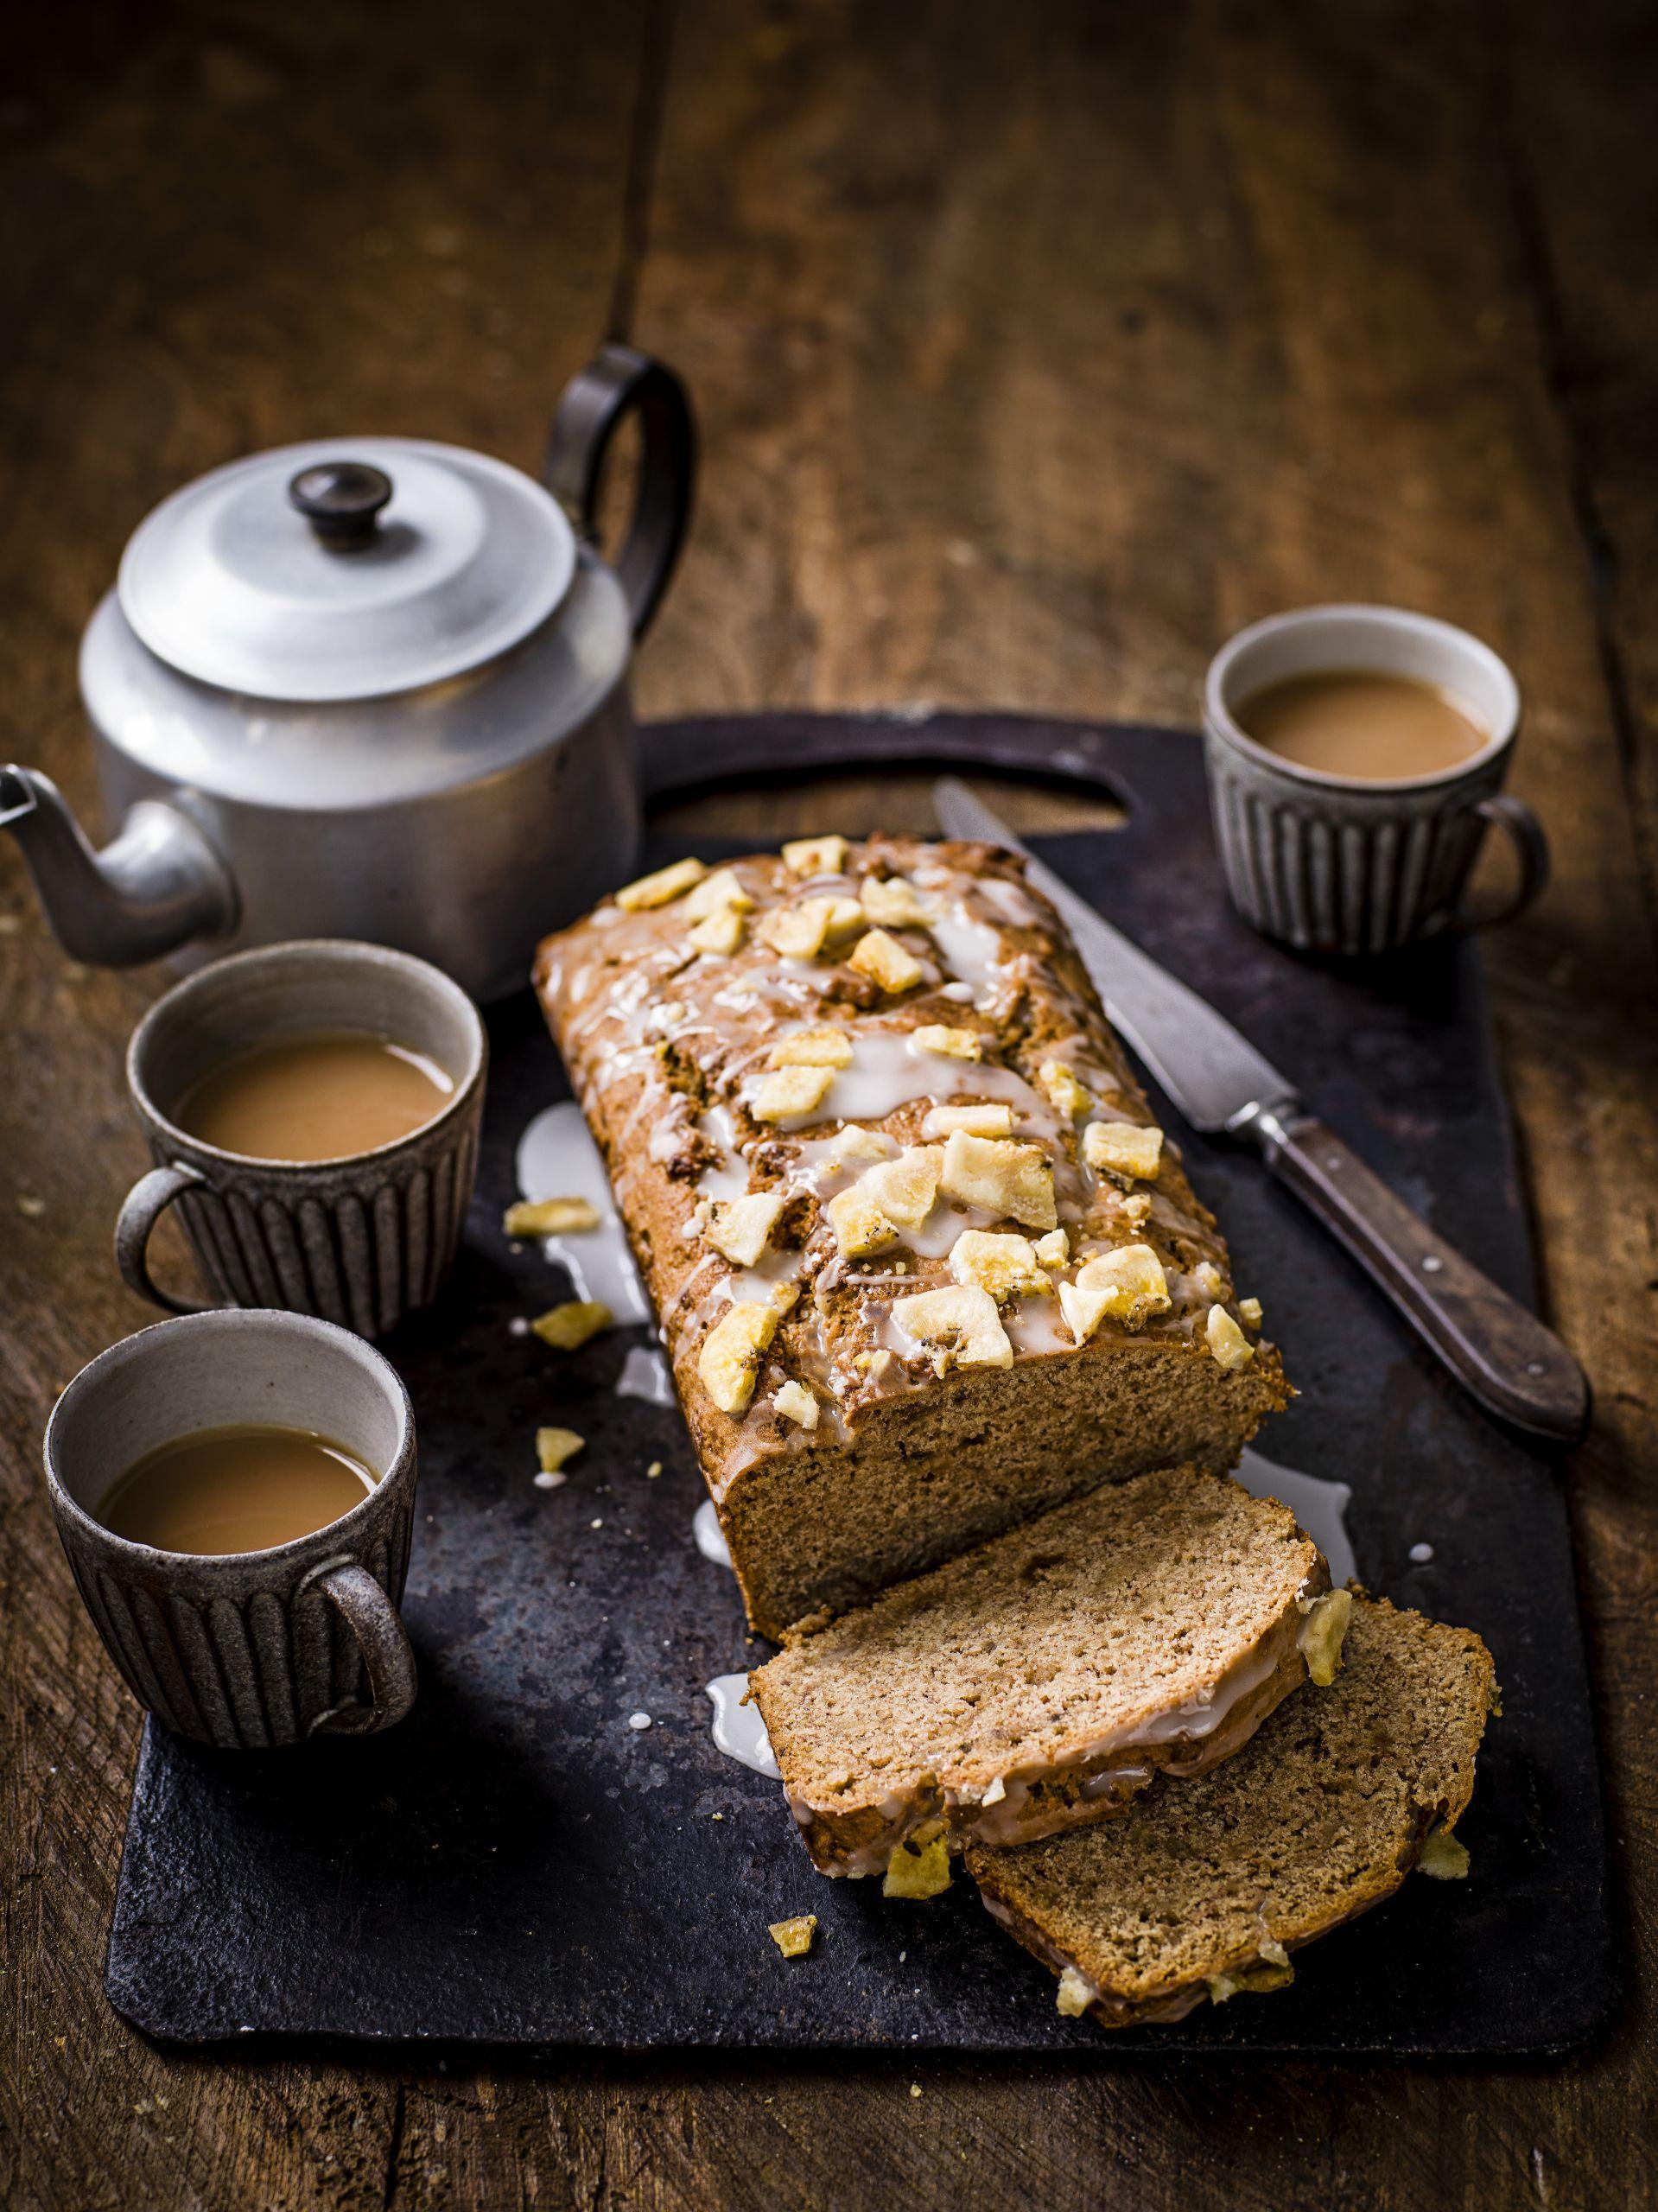 Easy Vegan Banana Bread  Easy Vegan Banana Bread Recipe olive magazine